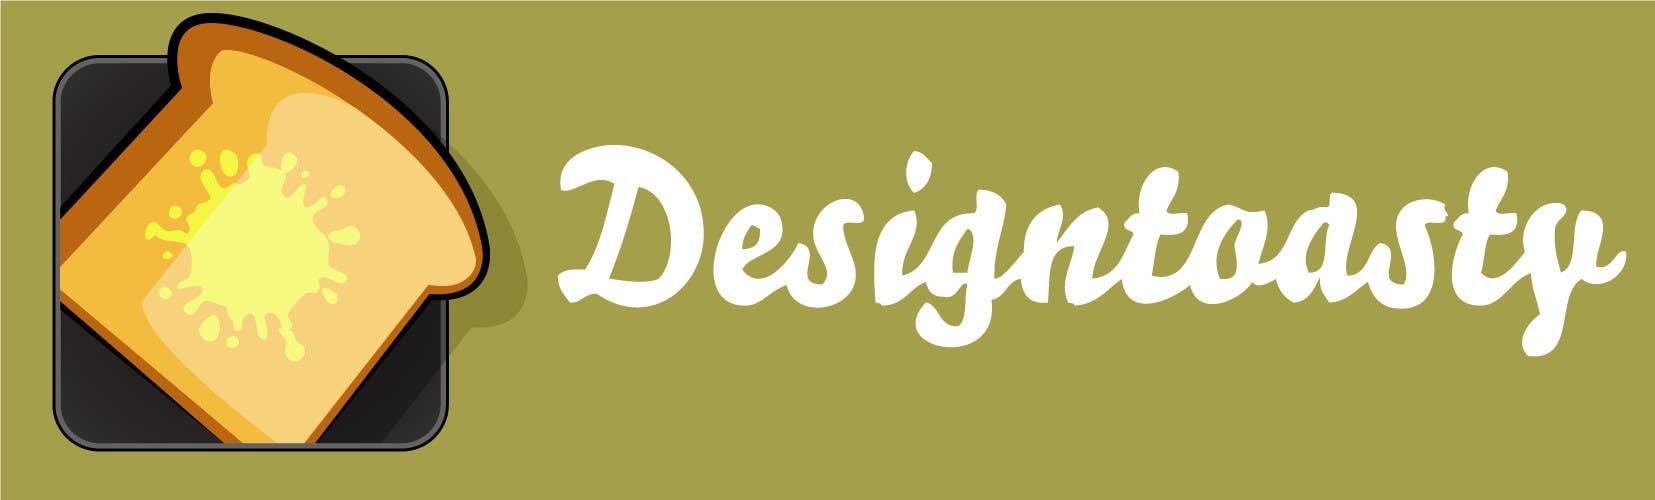 Bài tham dự cuộc thi #11 cho Design Logo-Icons like Envato Marktplaces